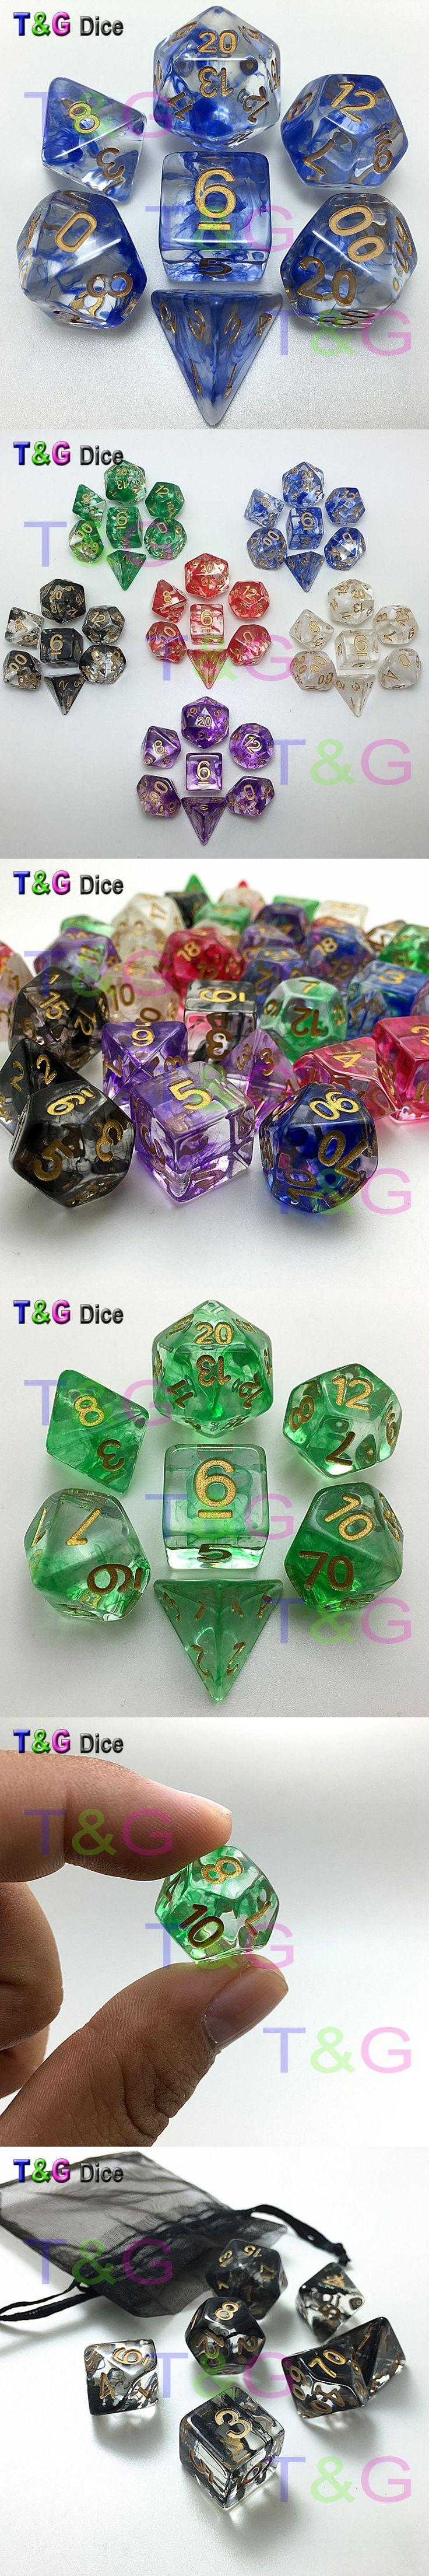 Brand New Dice Polyhedral Nebula Blue w White Set of 7 for D&d Game plus POUCH BAG d4 d6 d8 d10 d12 d20 dice set Gift Toy